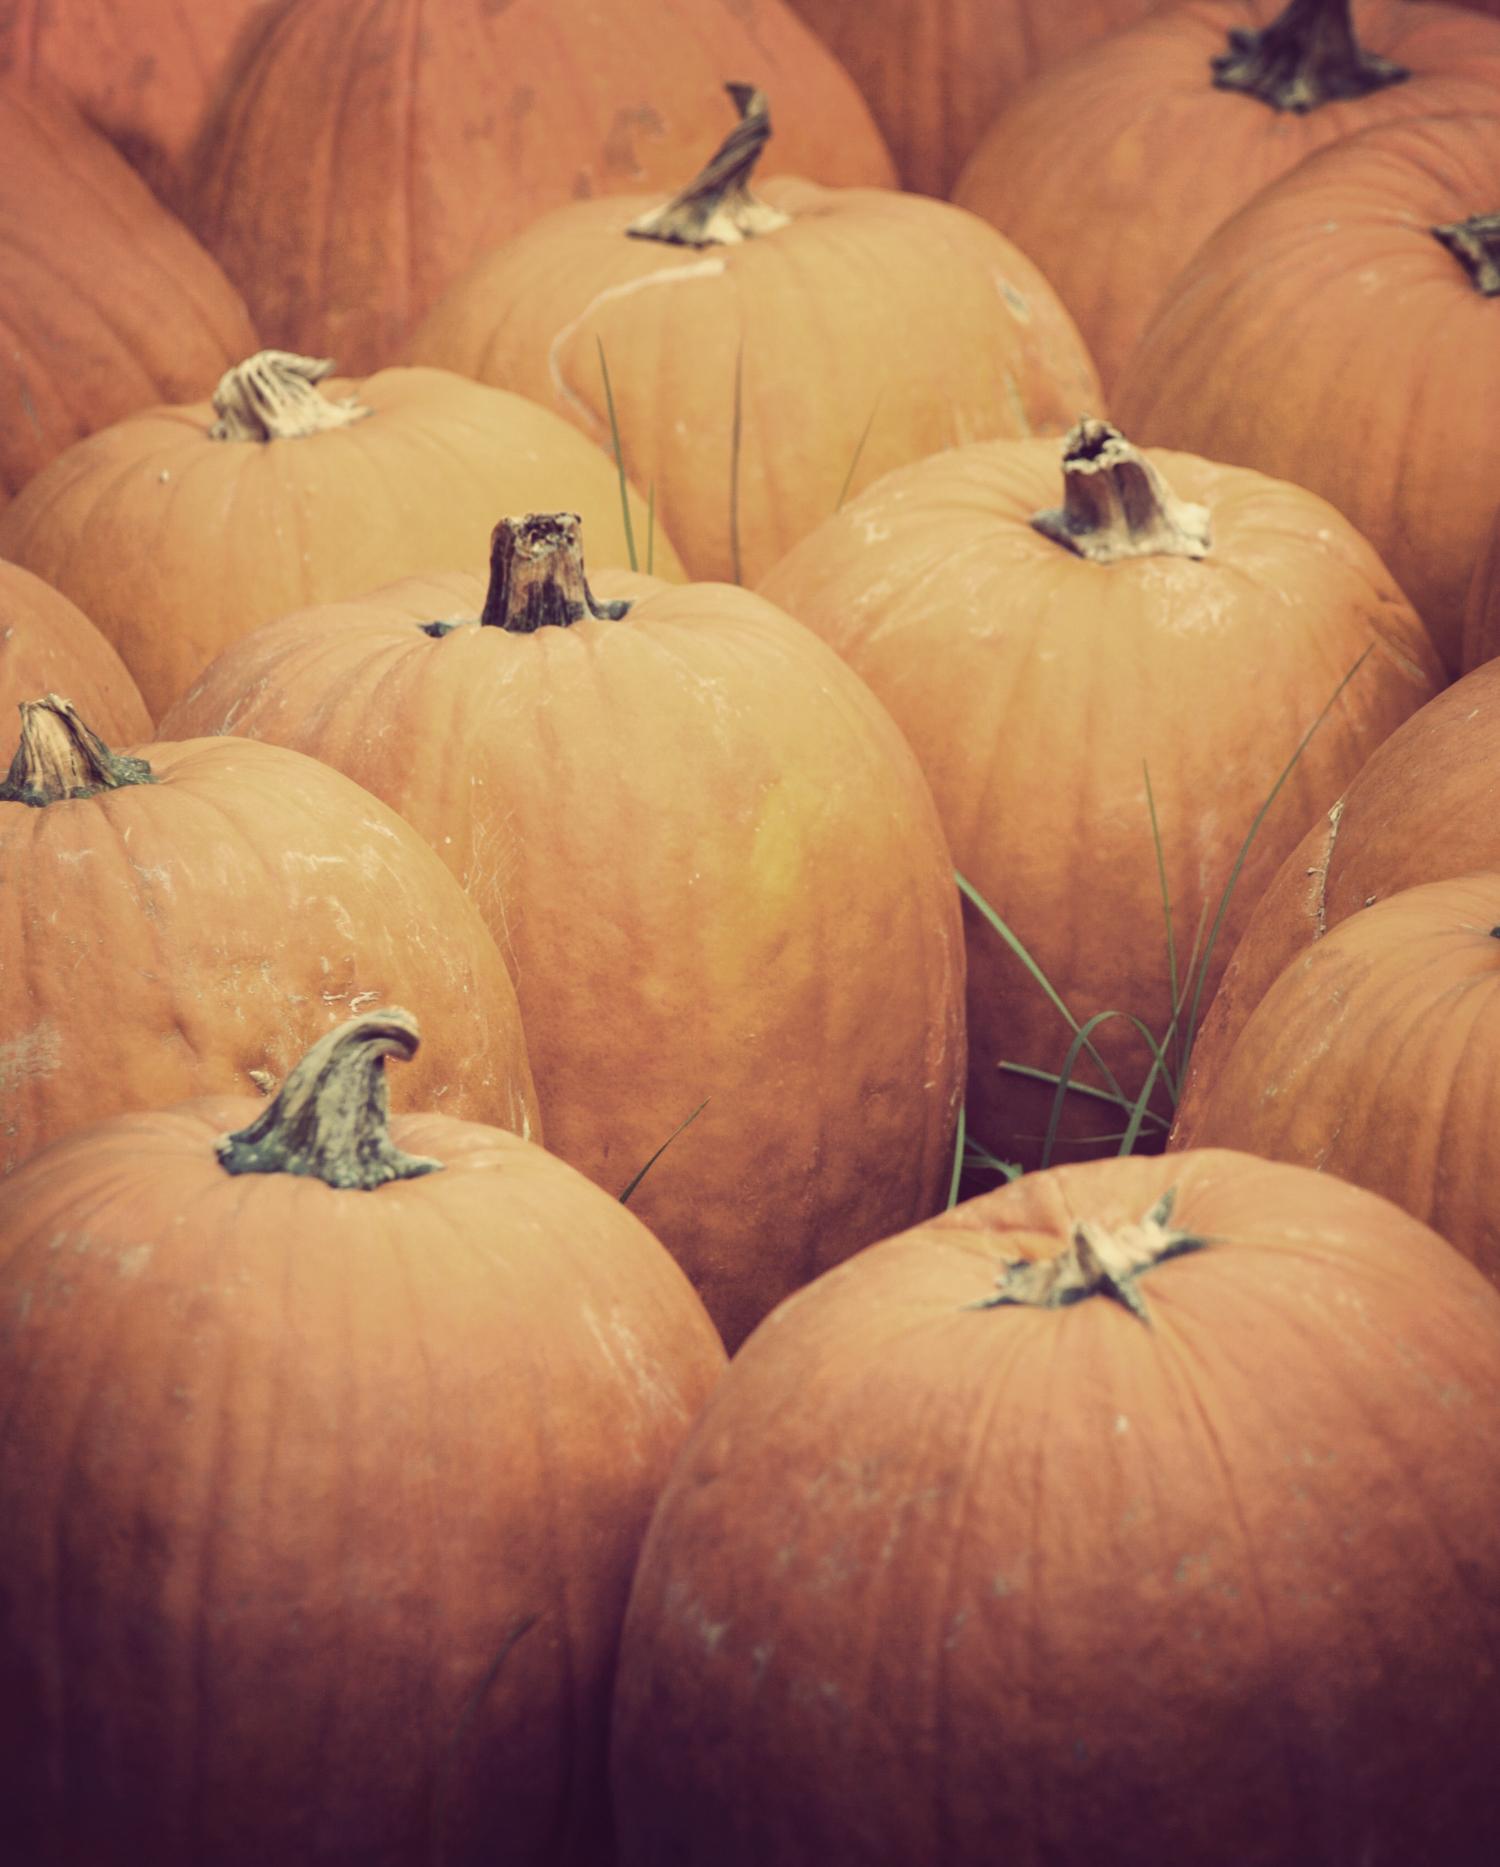 The pumpkin patch at Ganyard Hill Farm in Durham, North Carolina.|© Christy Hydeck